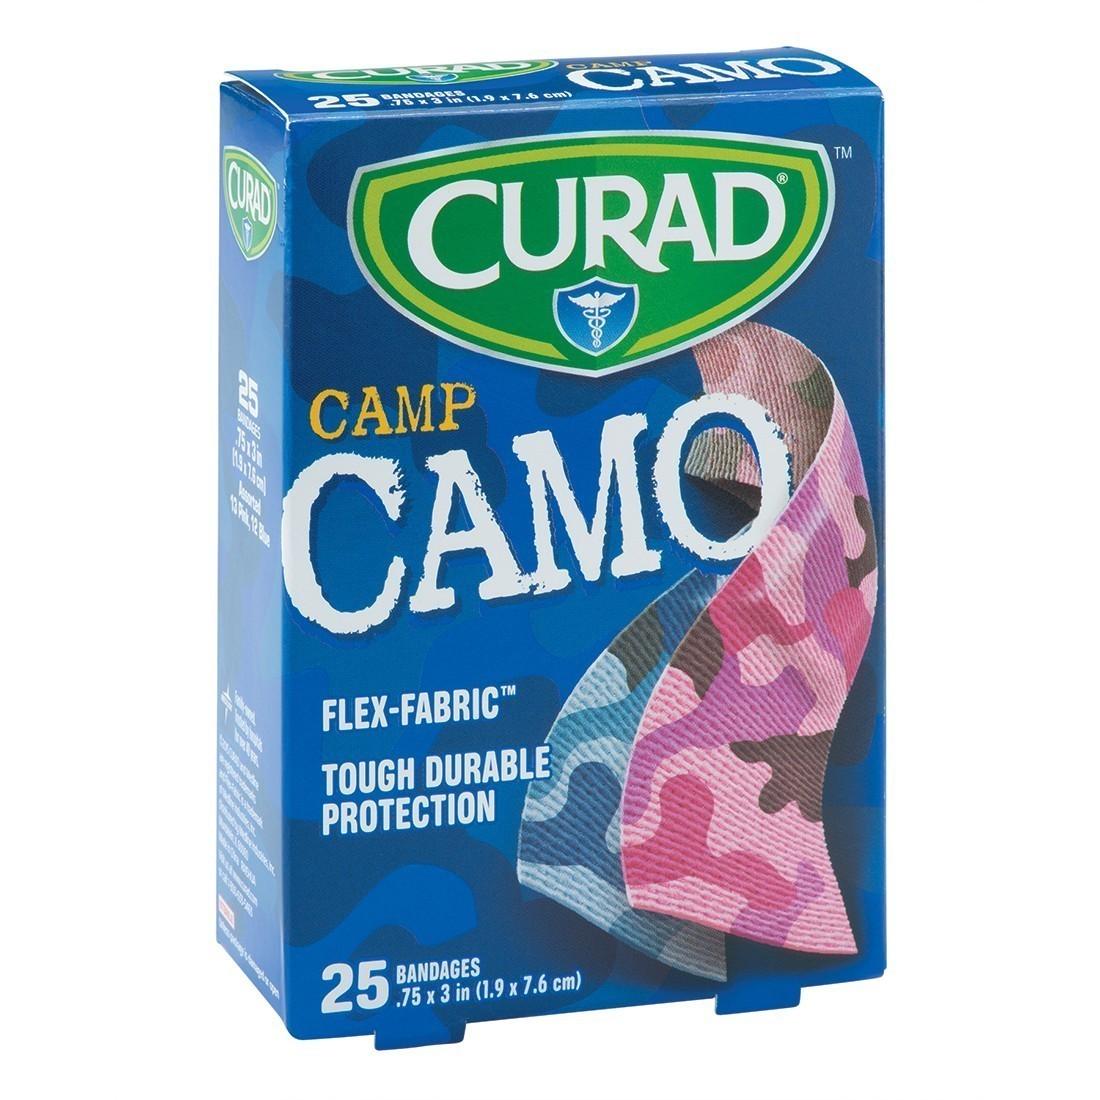 Curad® Pink/Blue Fabric Camo Bandages [image]